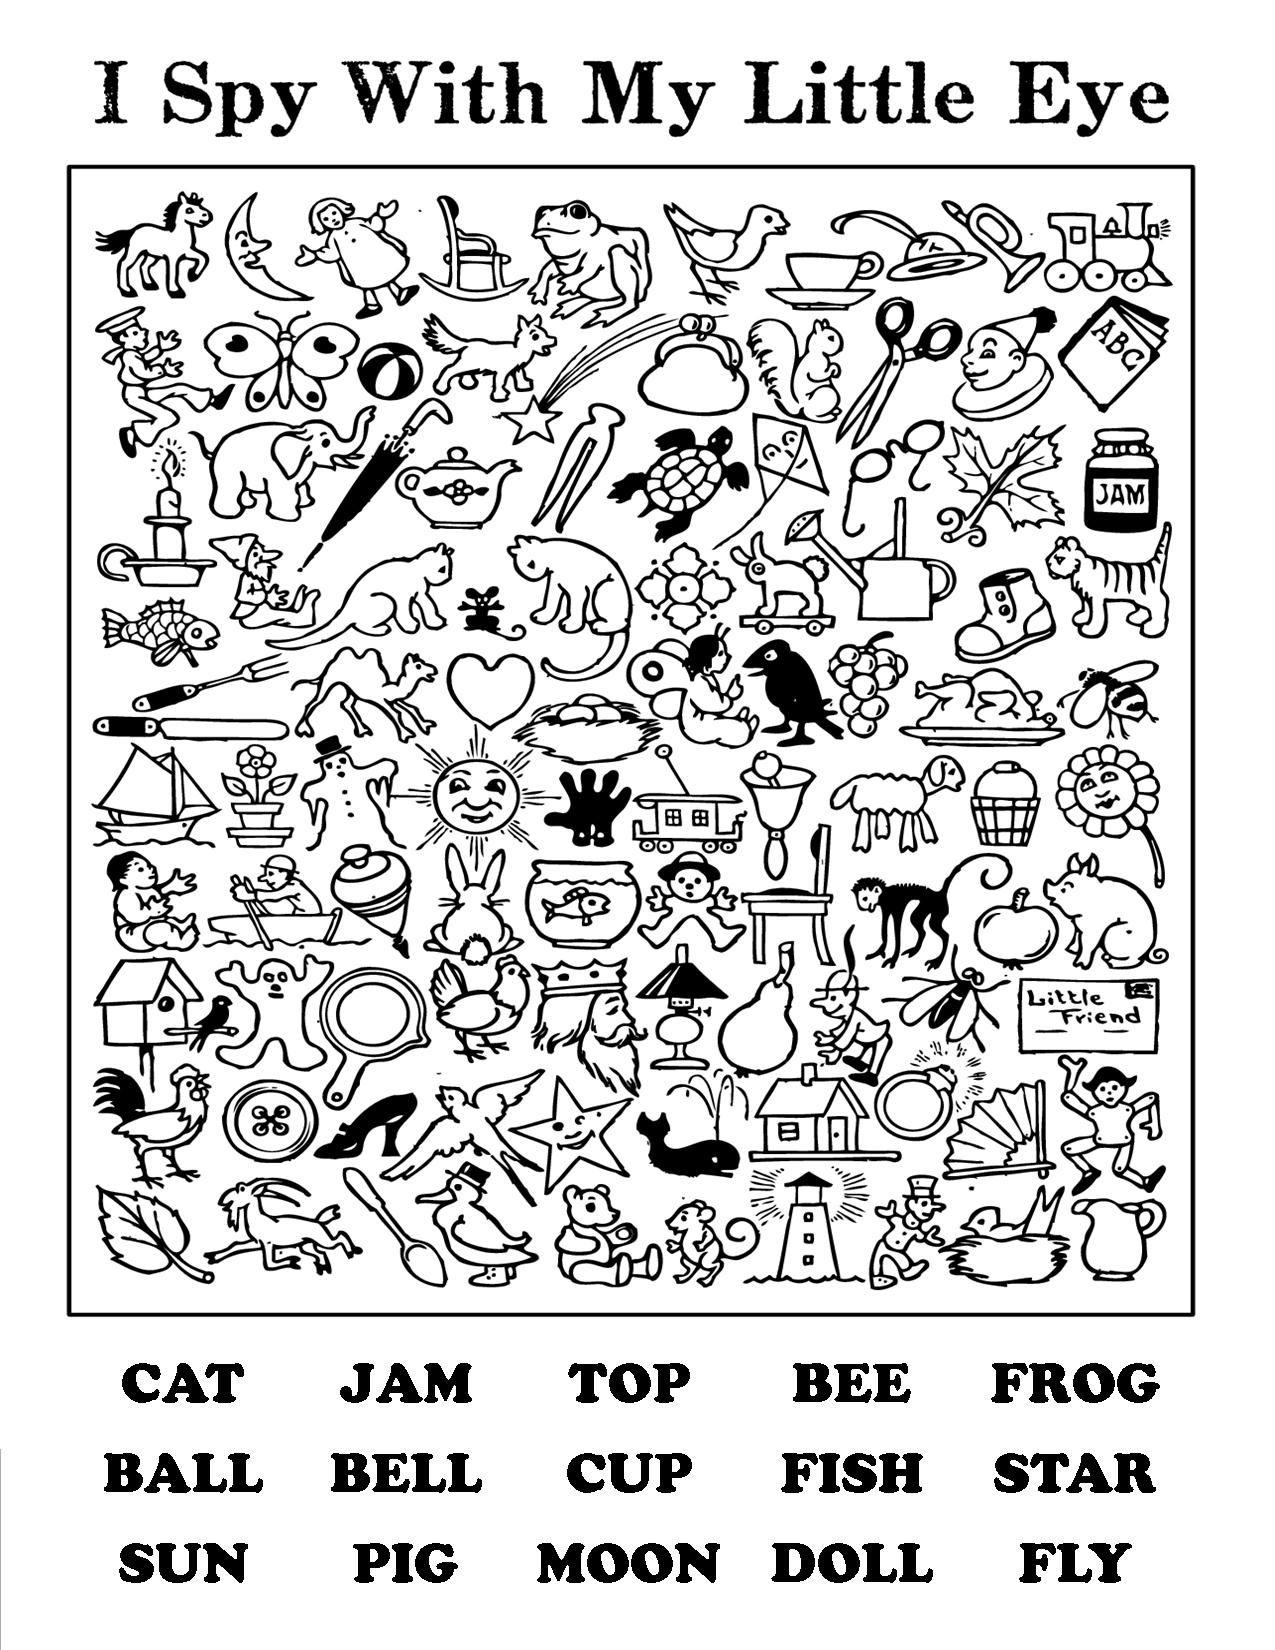 I Spy Printable Worksheets That Are Stupendous | Jackson Website with I Spy Alphabet Worksheets